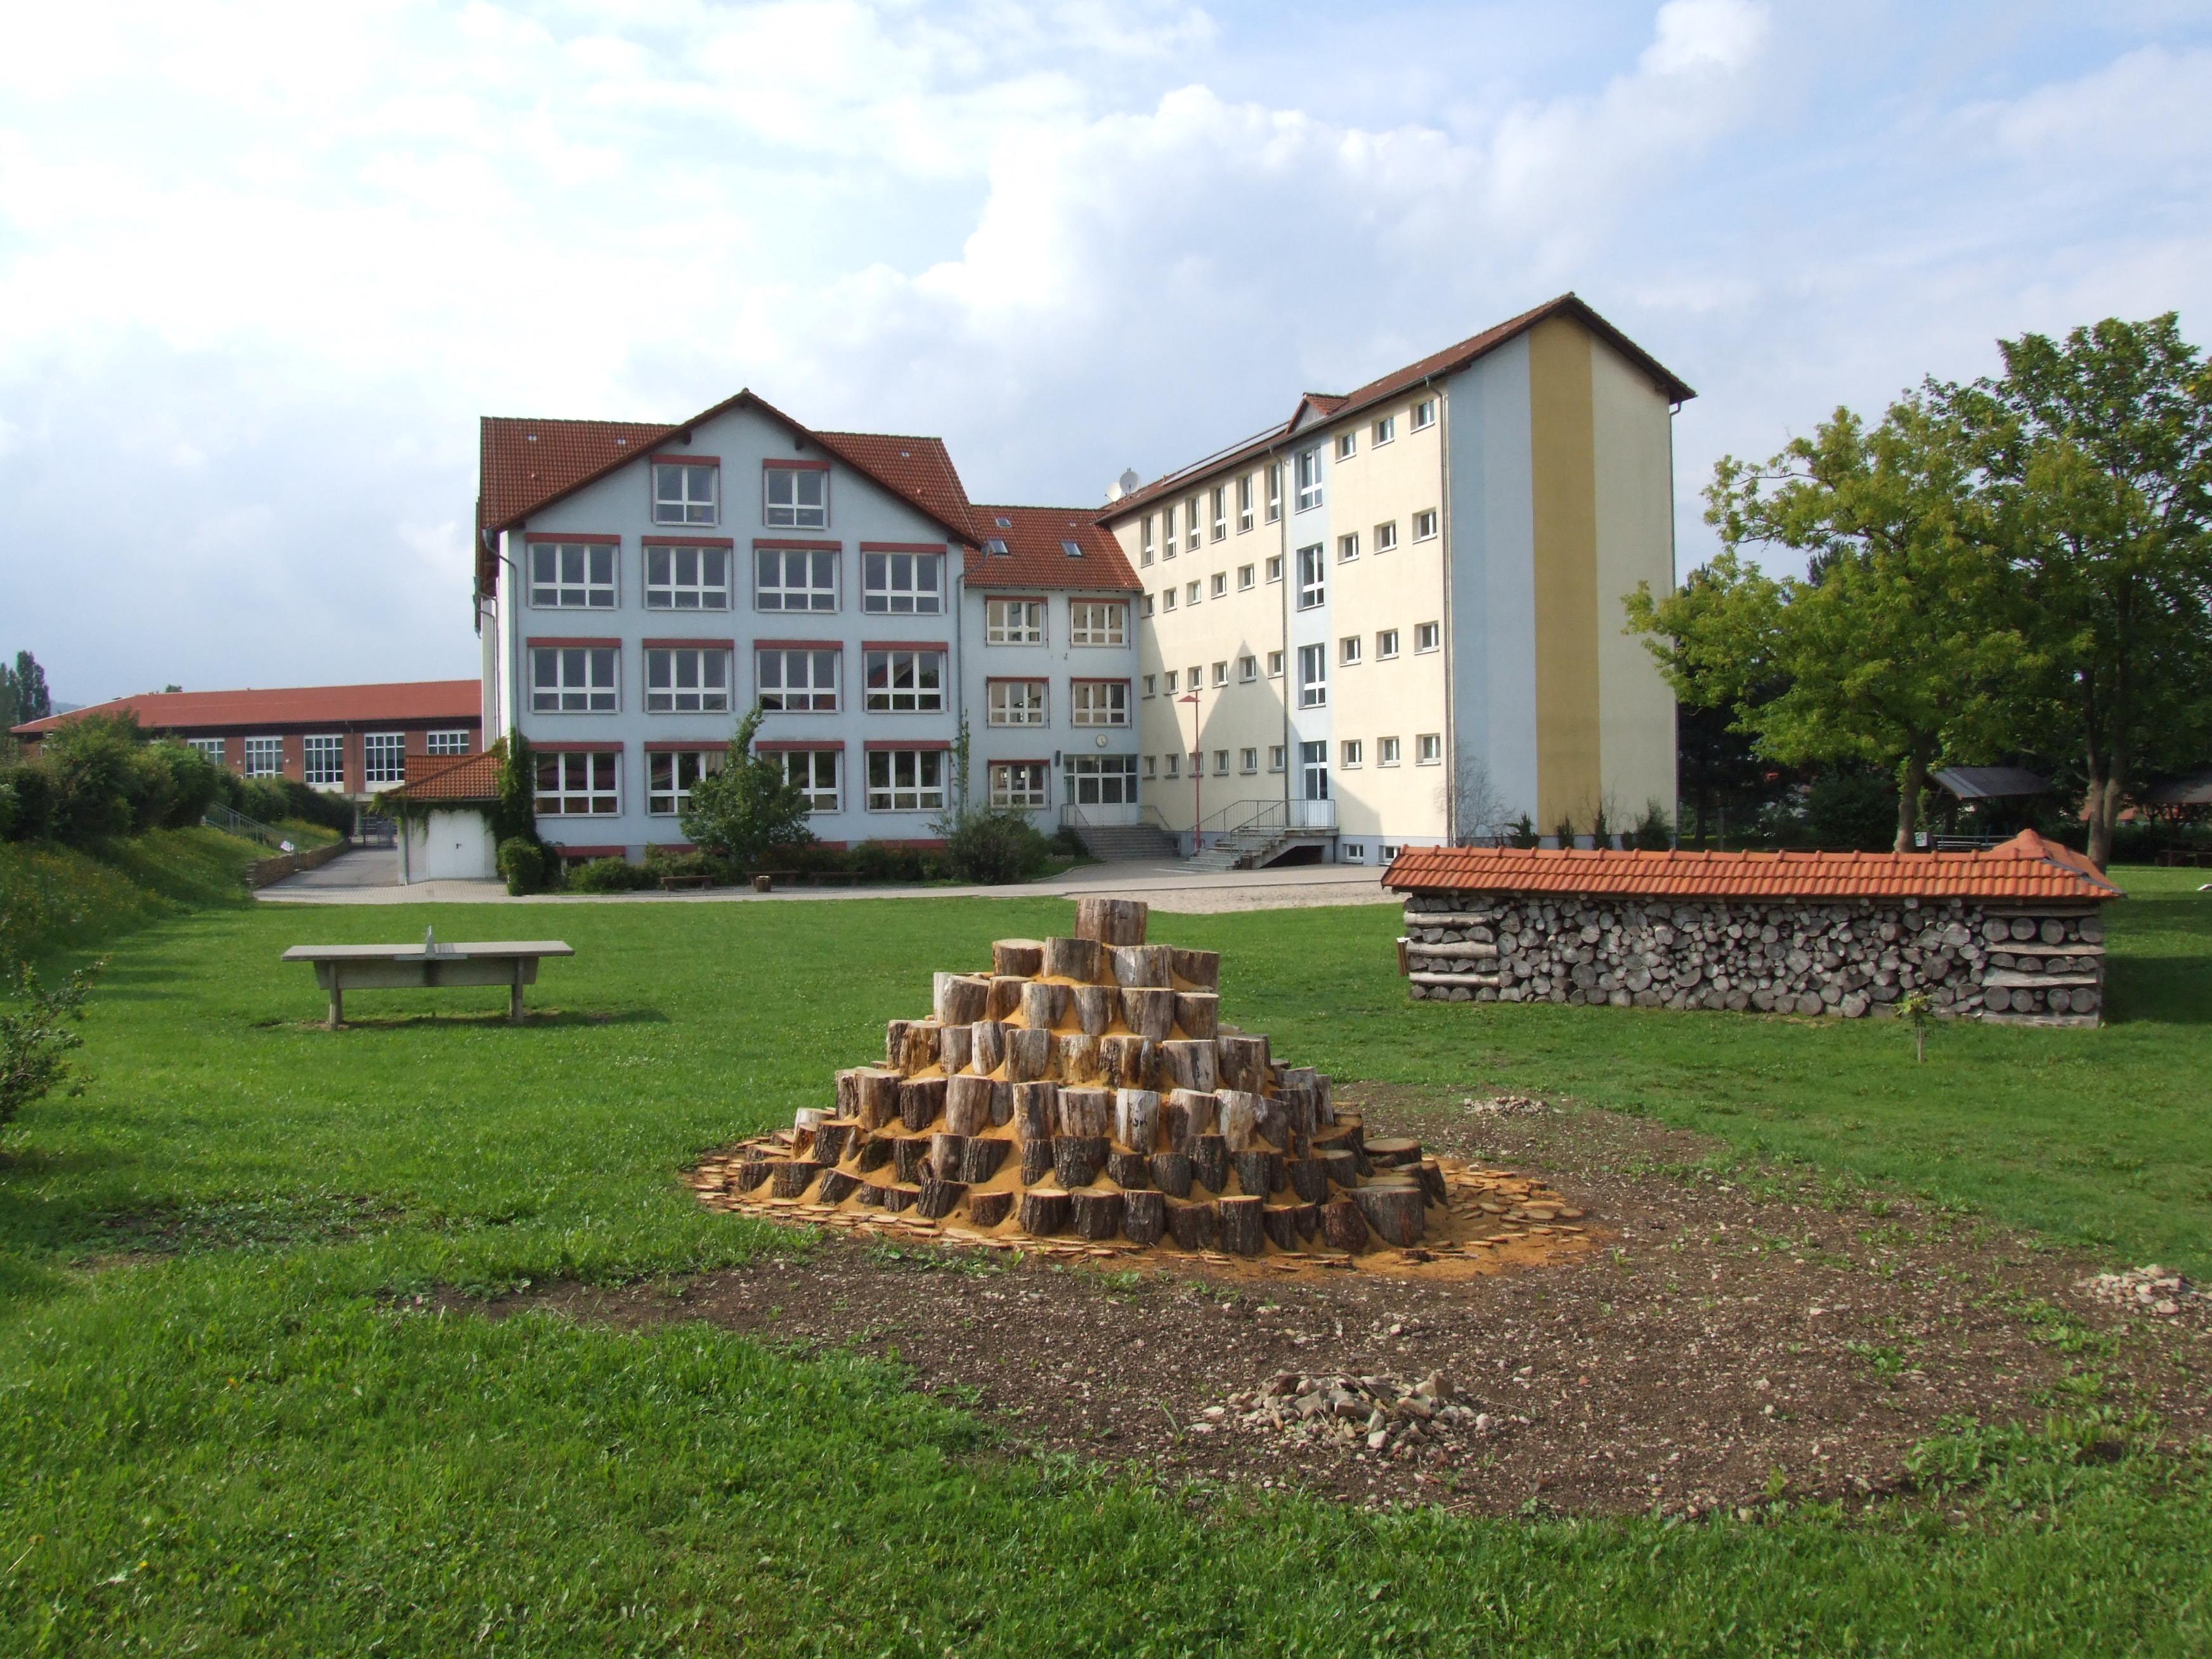 Rhöngymnasium Kaltensundheim